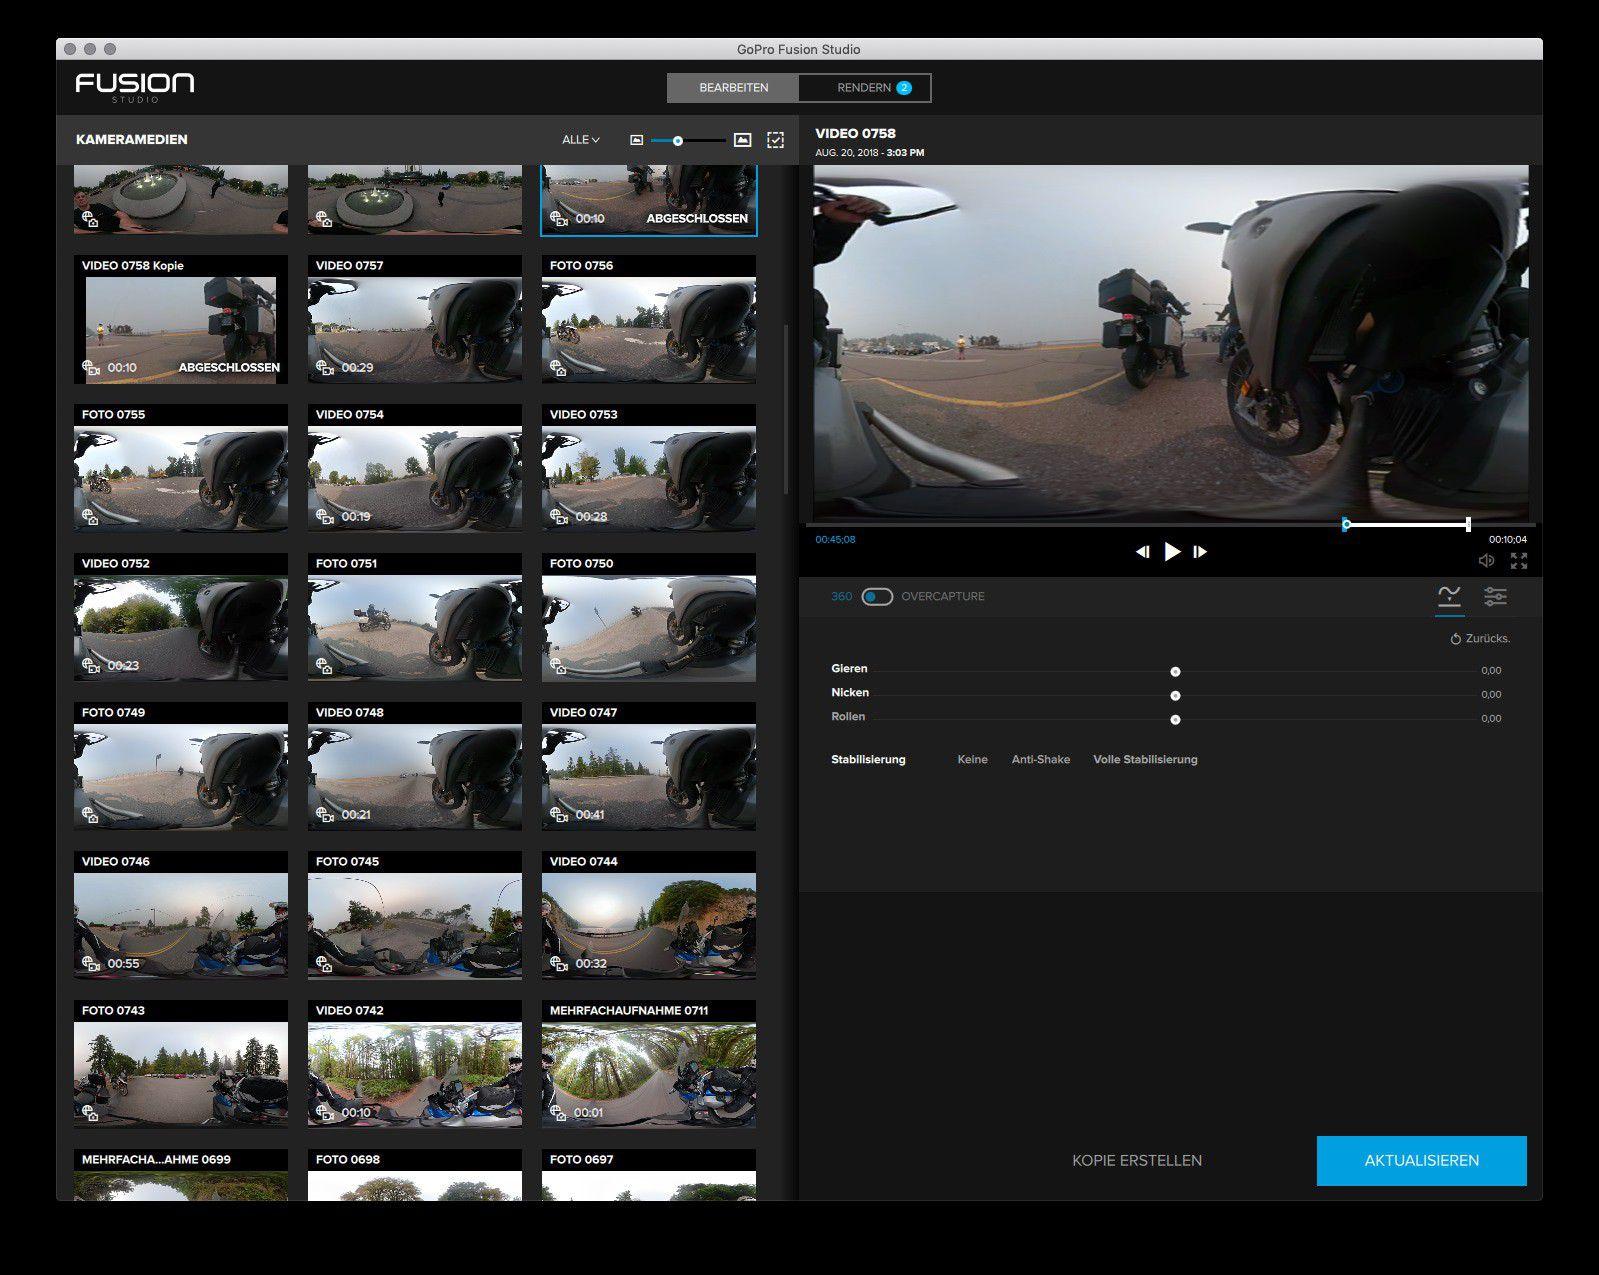 GoPro Fusion im Test: Faszination 360-Grad-Video - Macwelt